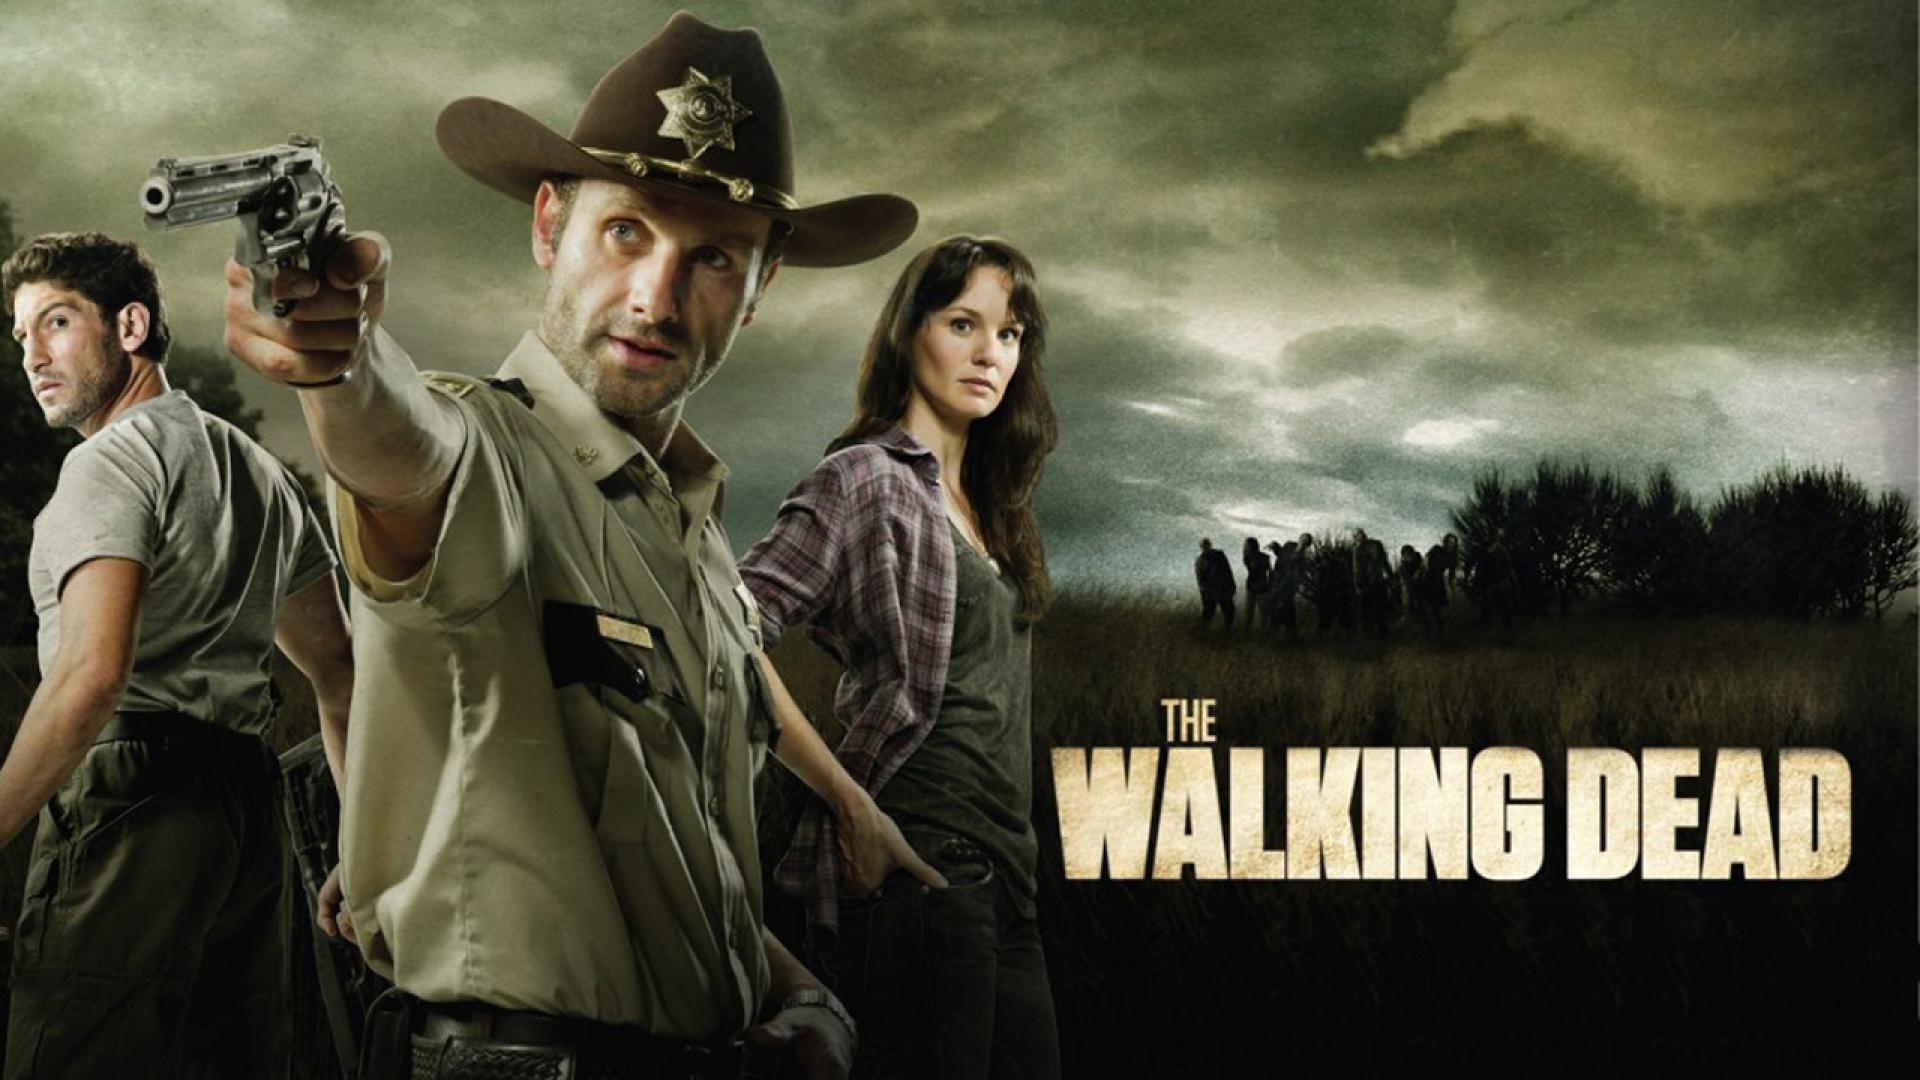 The Walking Dead free image